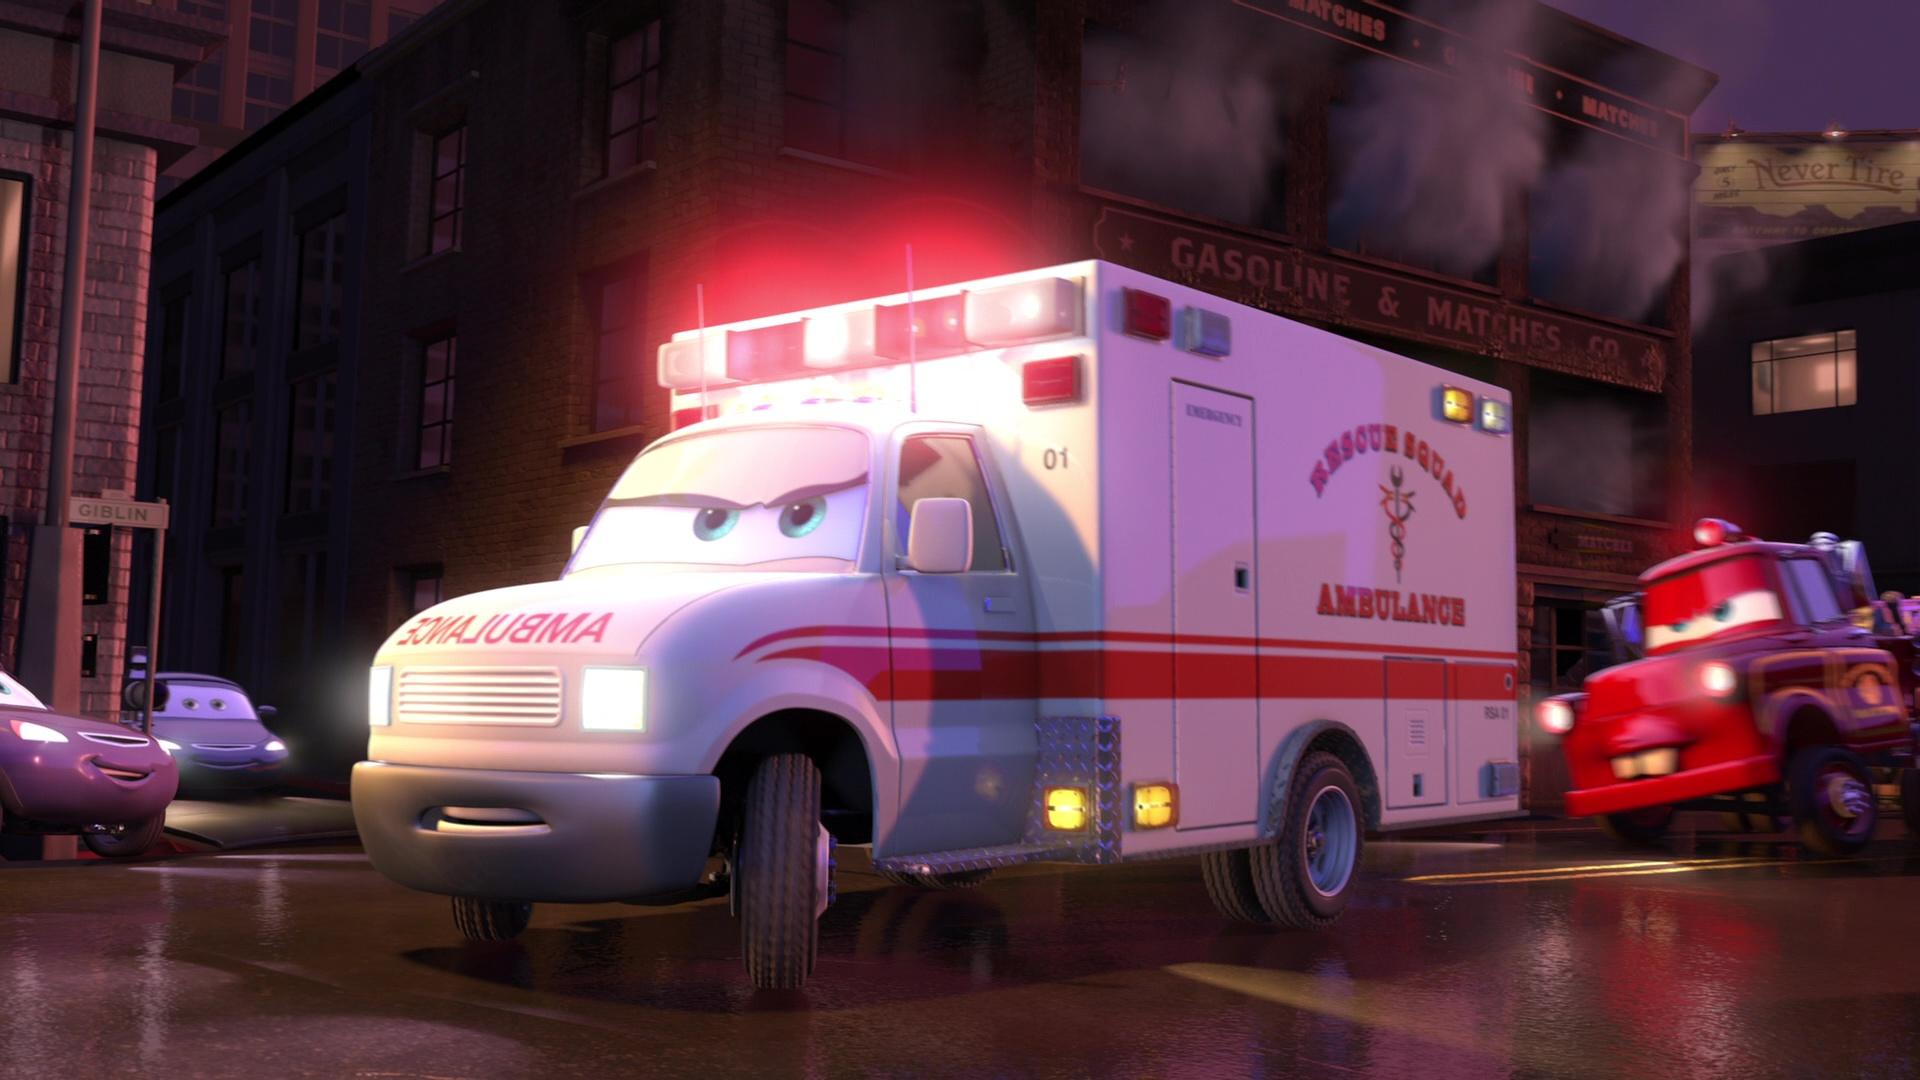 pixar disney personnage character cars toon martin à la rescousse rescue squad mater ambulance